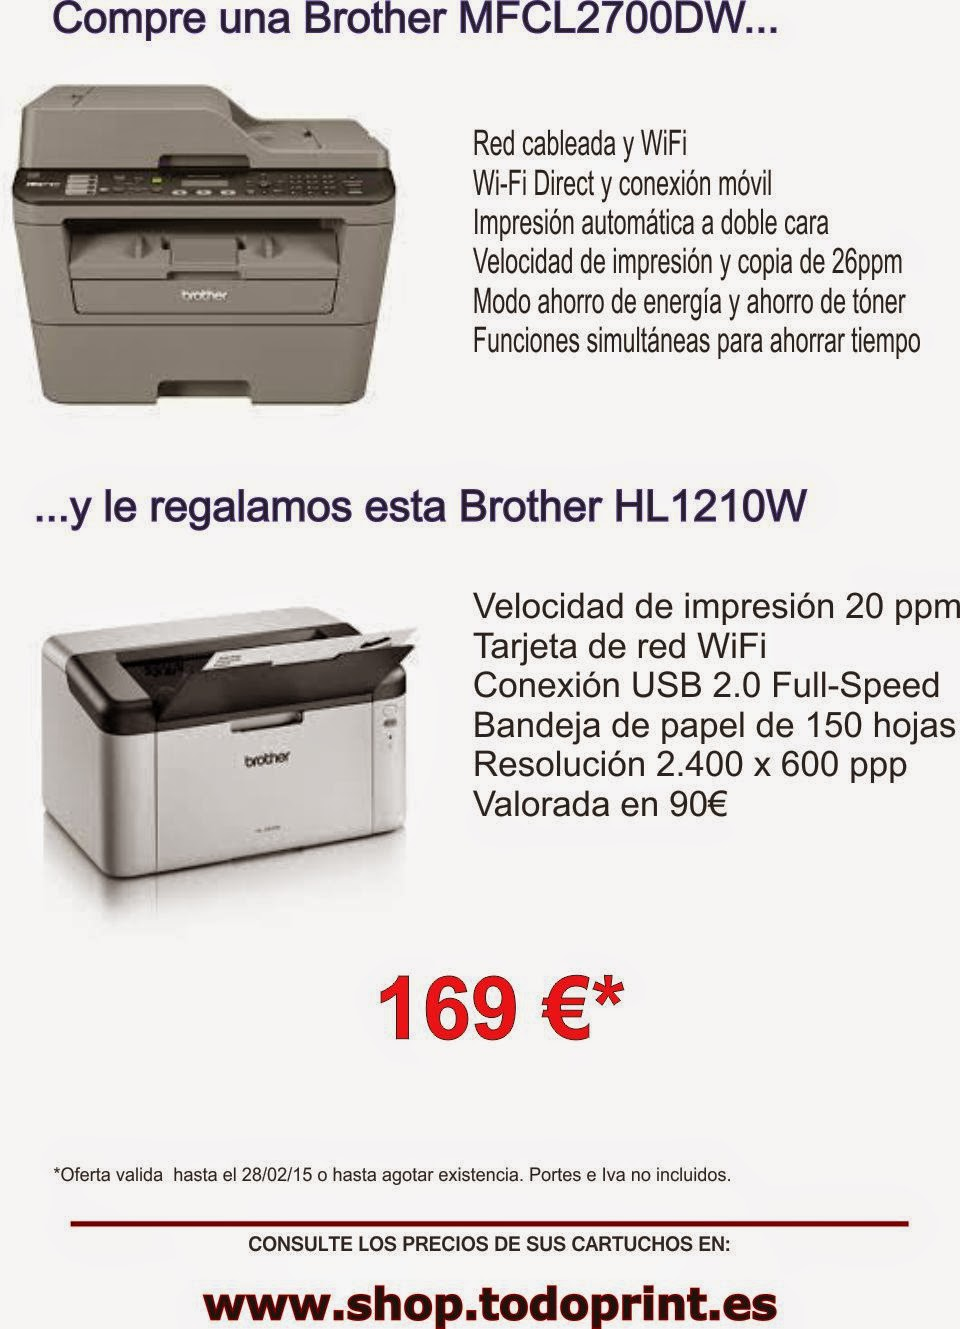 www.todoprint.es